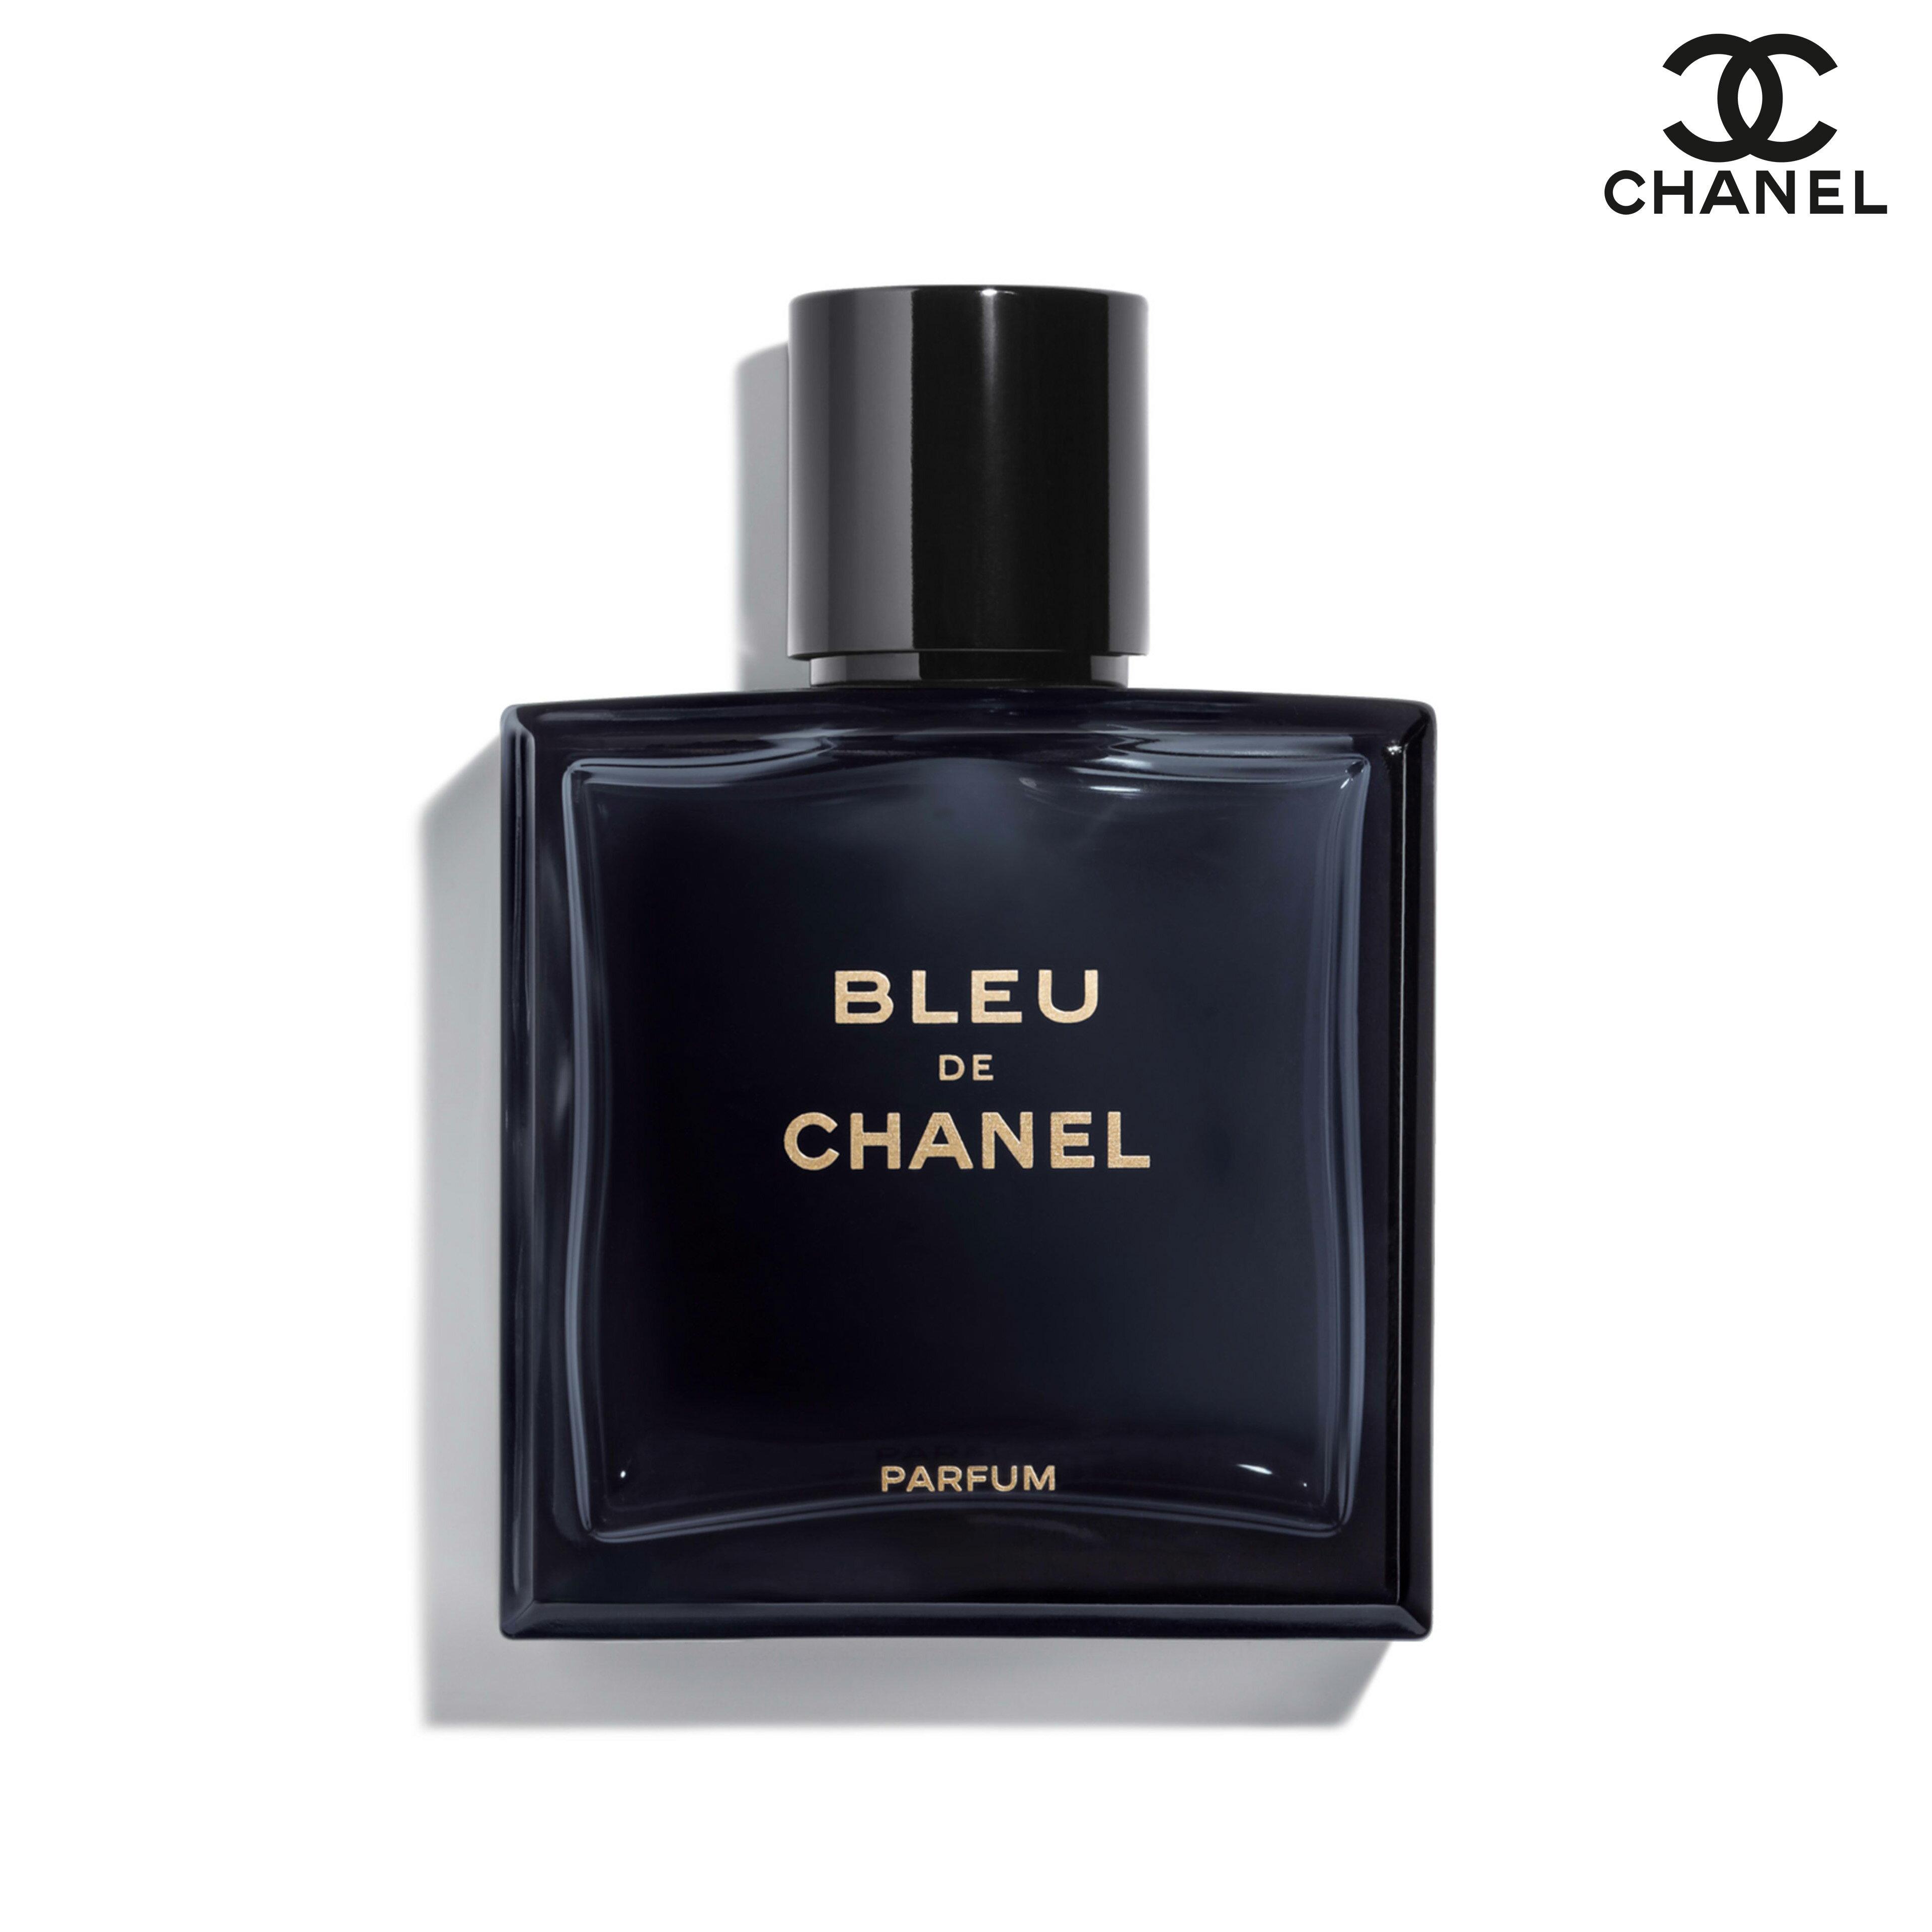 CHANEL香奈兒 Bleu de Chanel 藍色男性香精 100ml  專櫃熱銷男香【SP嚴選家】 0